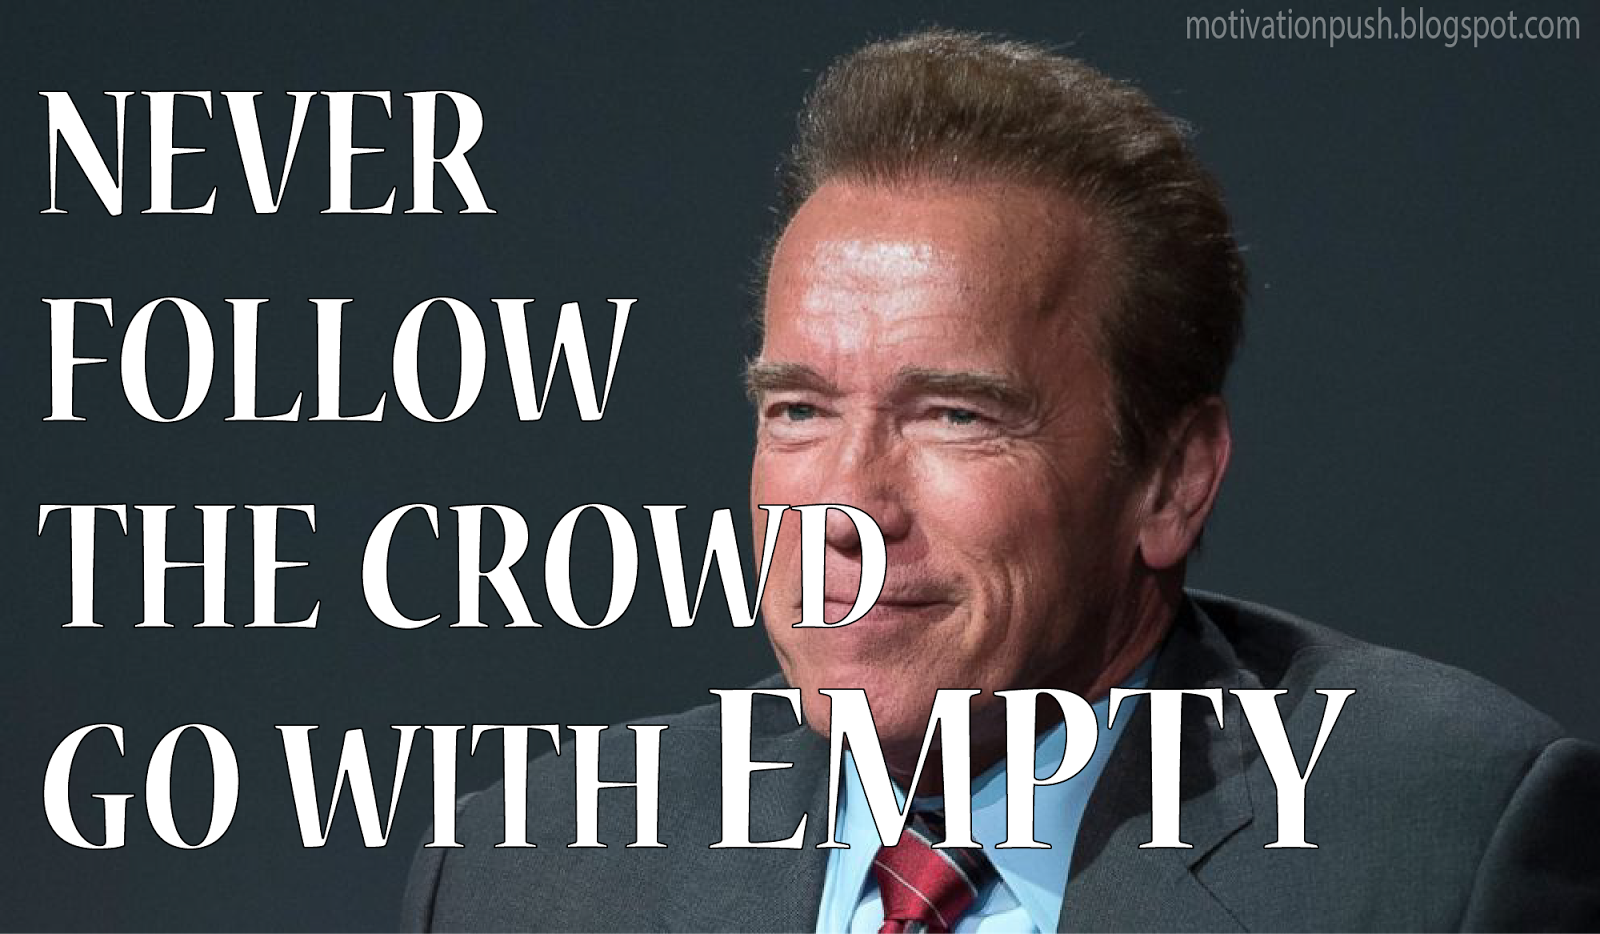 Arnold Schwarzeneggeru0027s Motivational Quotes